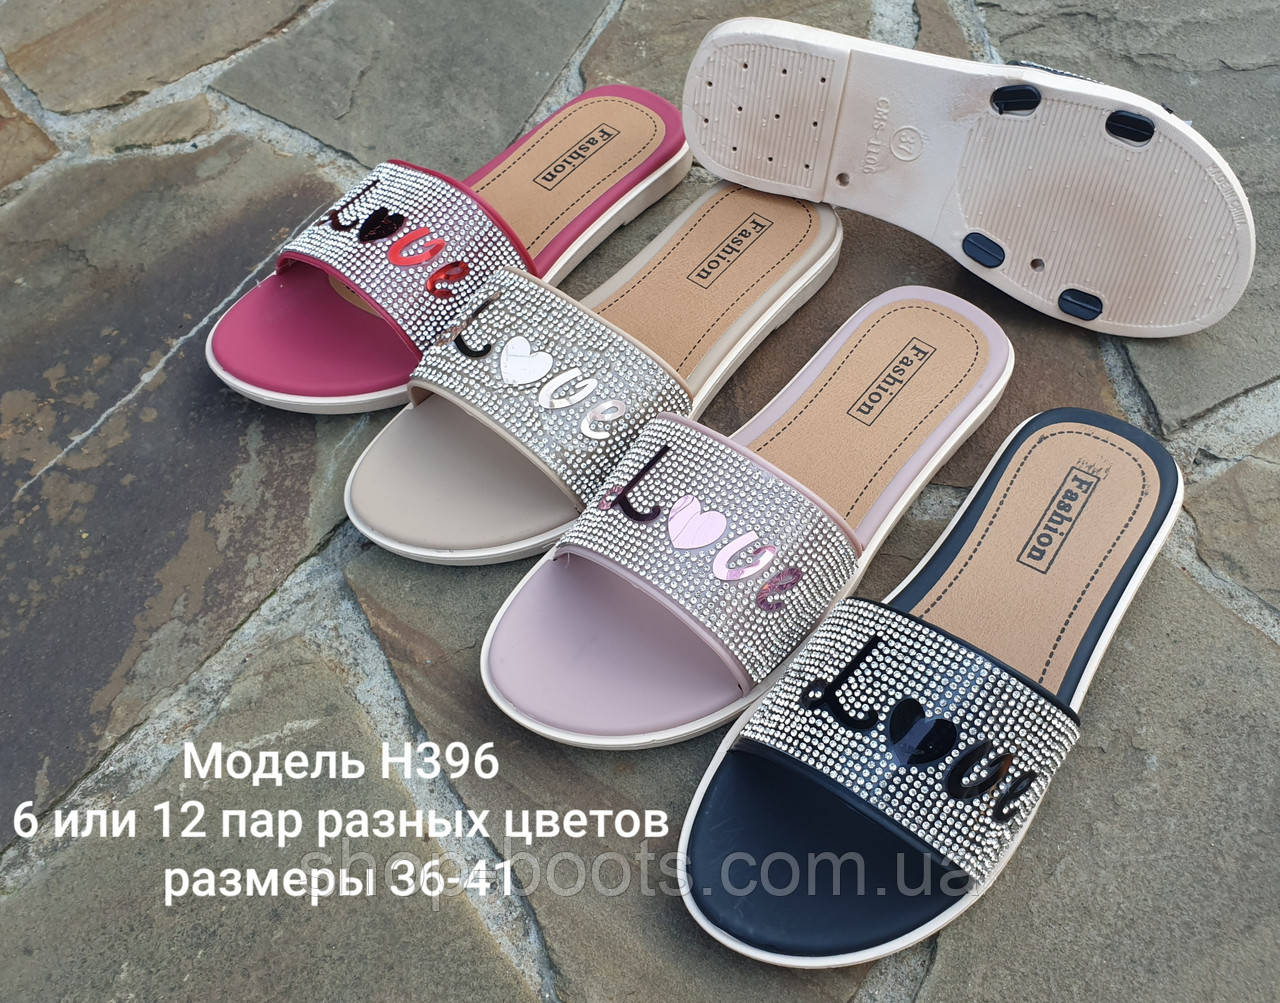 Женские шлепанцы оптом. 36-41рр. Модель шлепки Н396